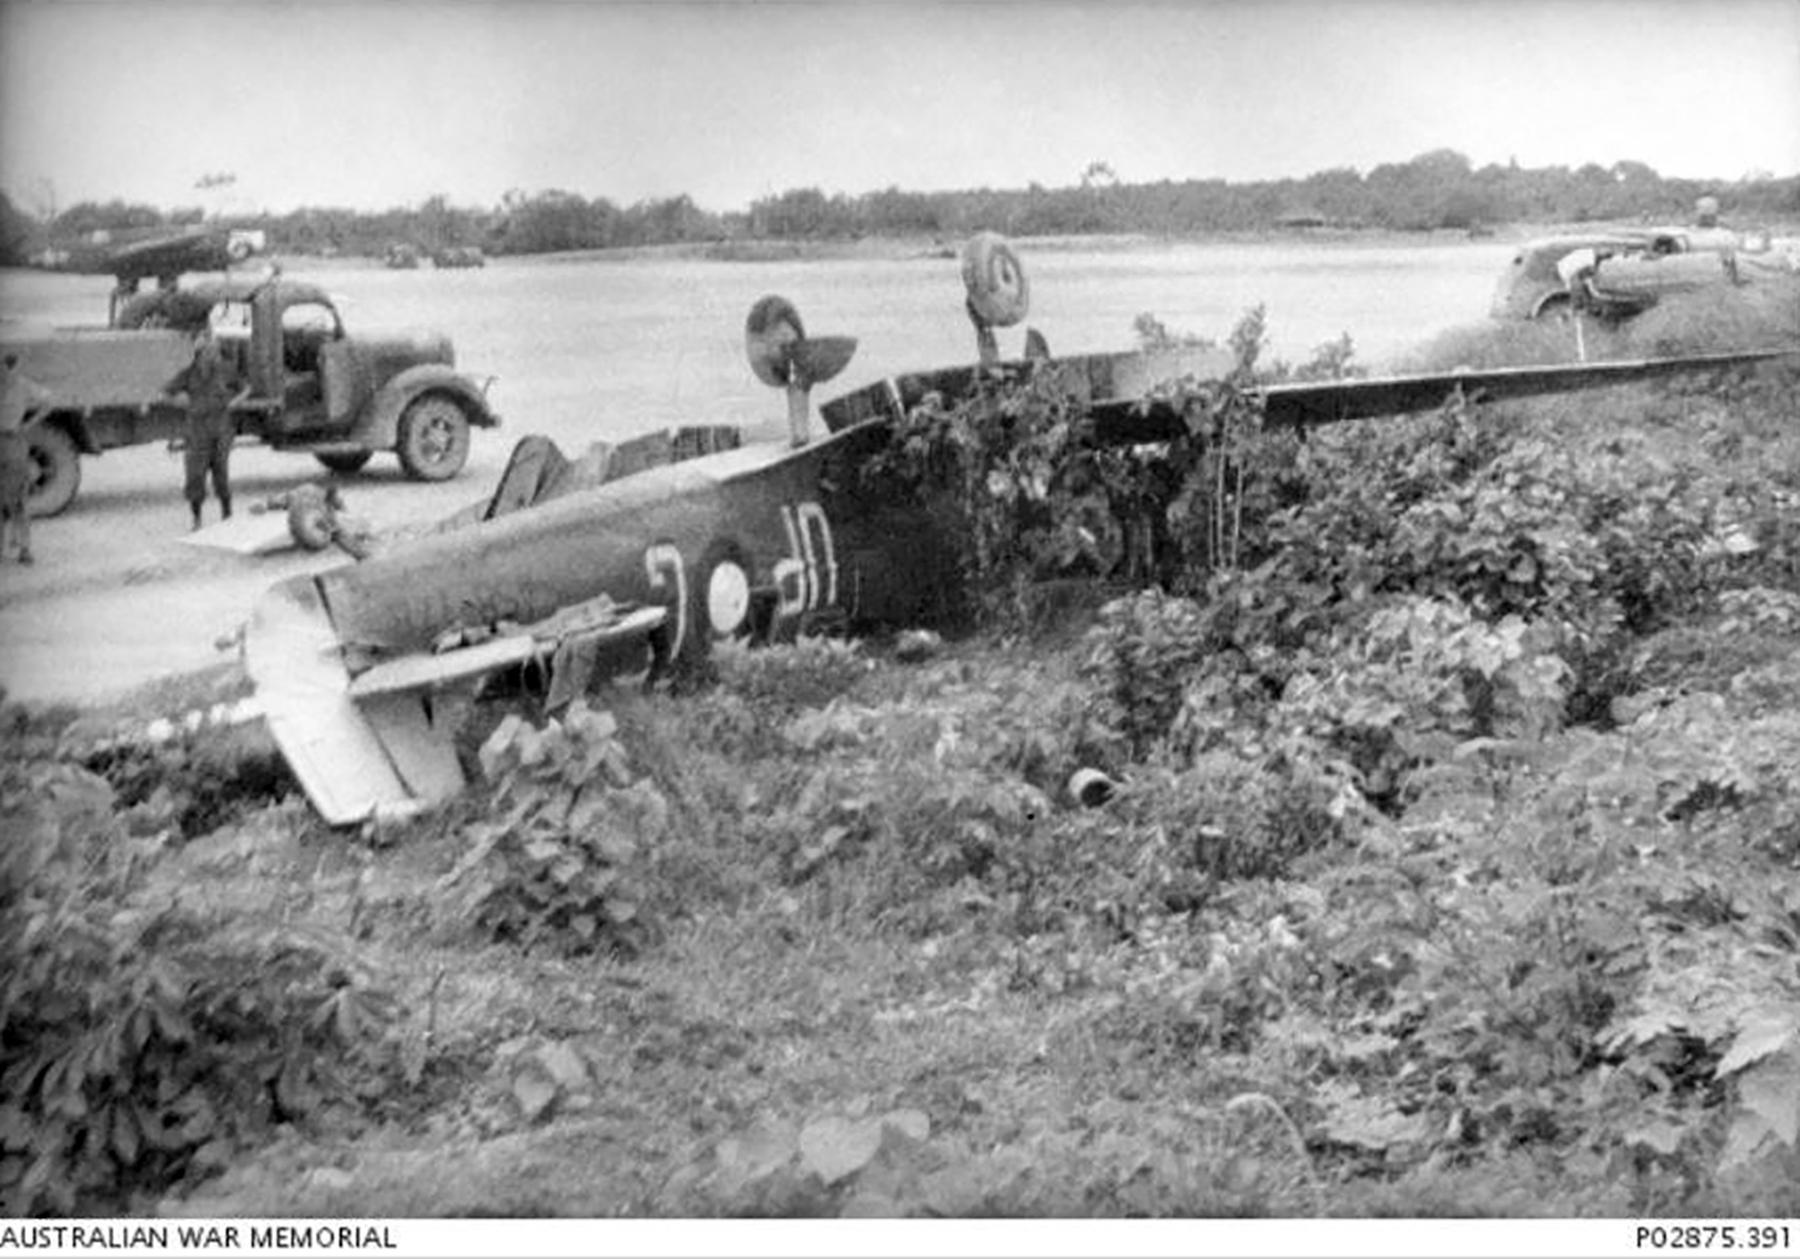 Spitfire MkVc RAAF 79Sqn UPG A58 178 landing accident Kiriwina 12 Jan 1944 AWM 02